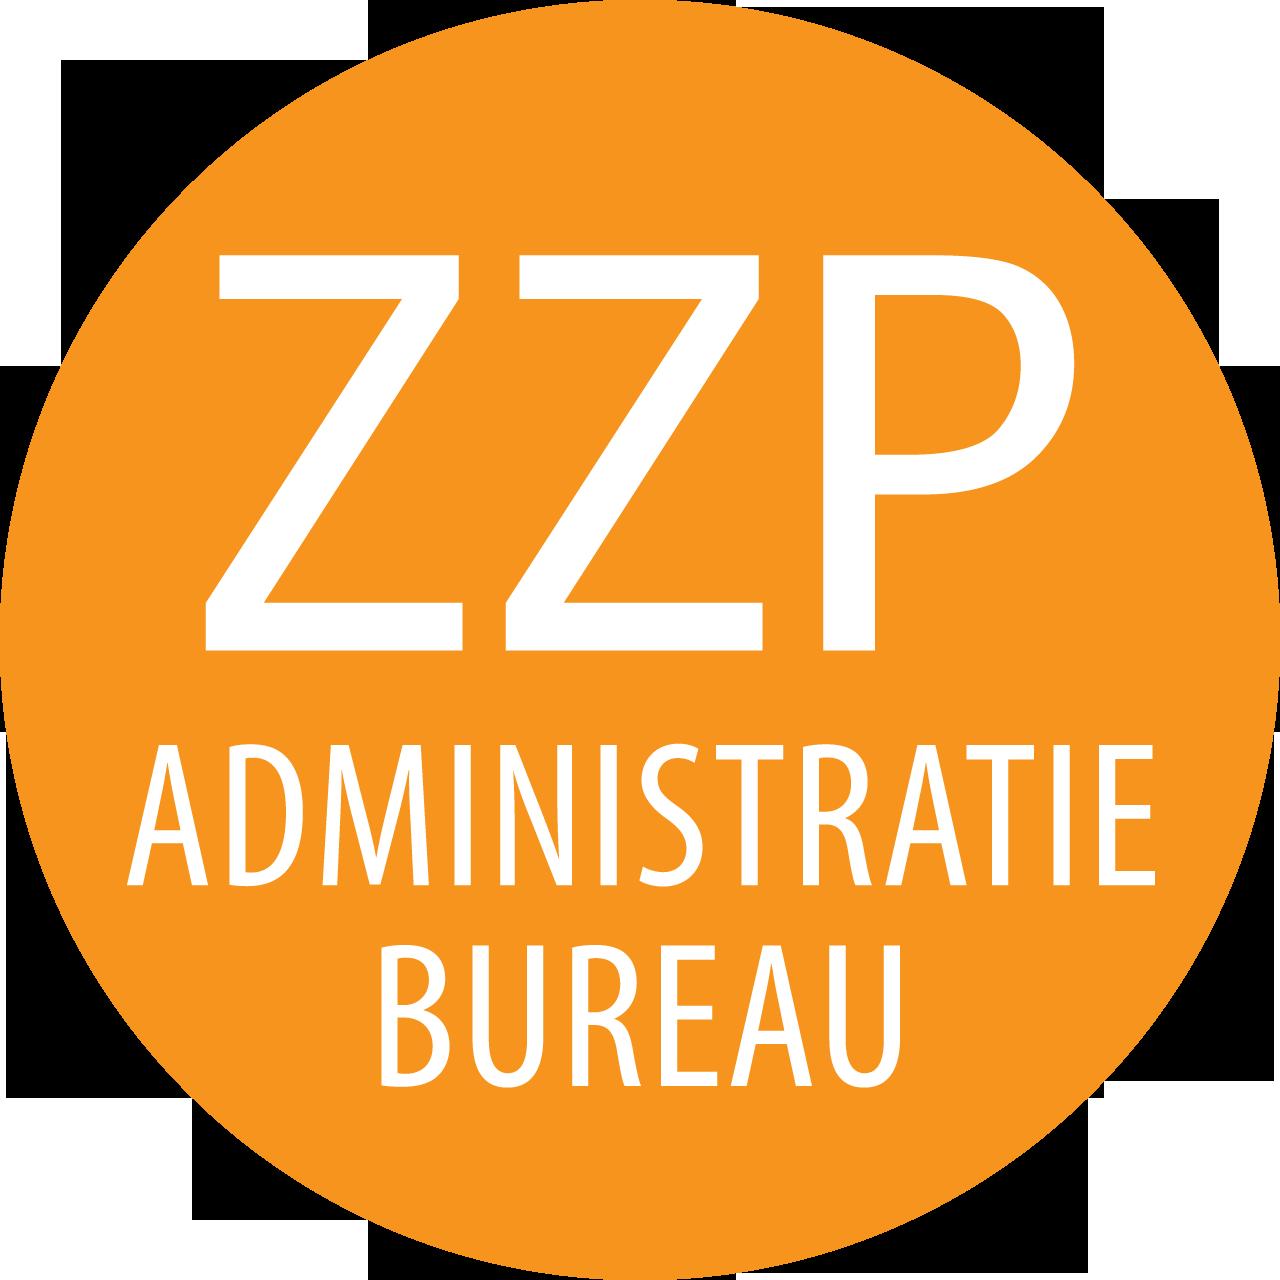 Administratie | Boekhouding | ZZP | MKB | Nunspeet